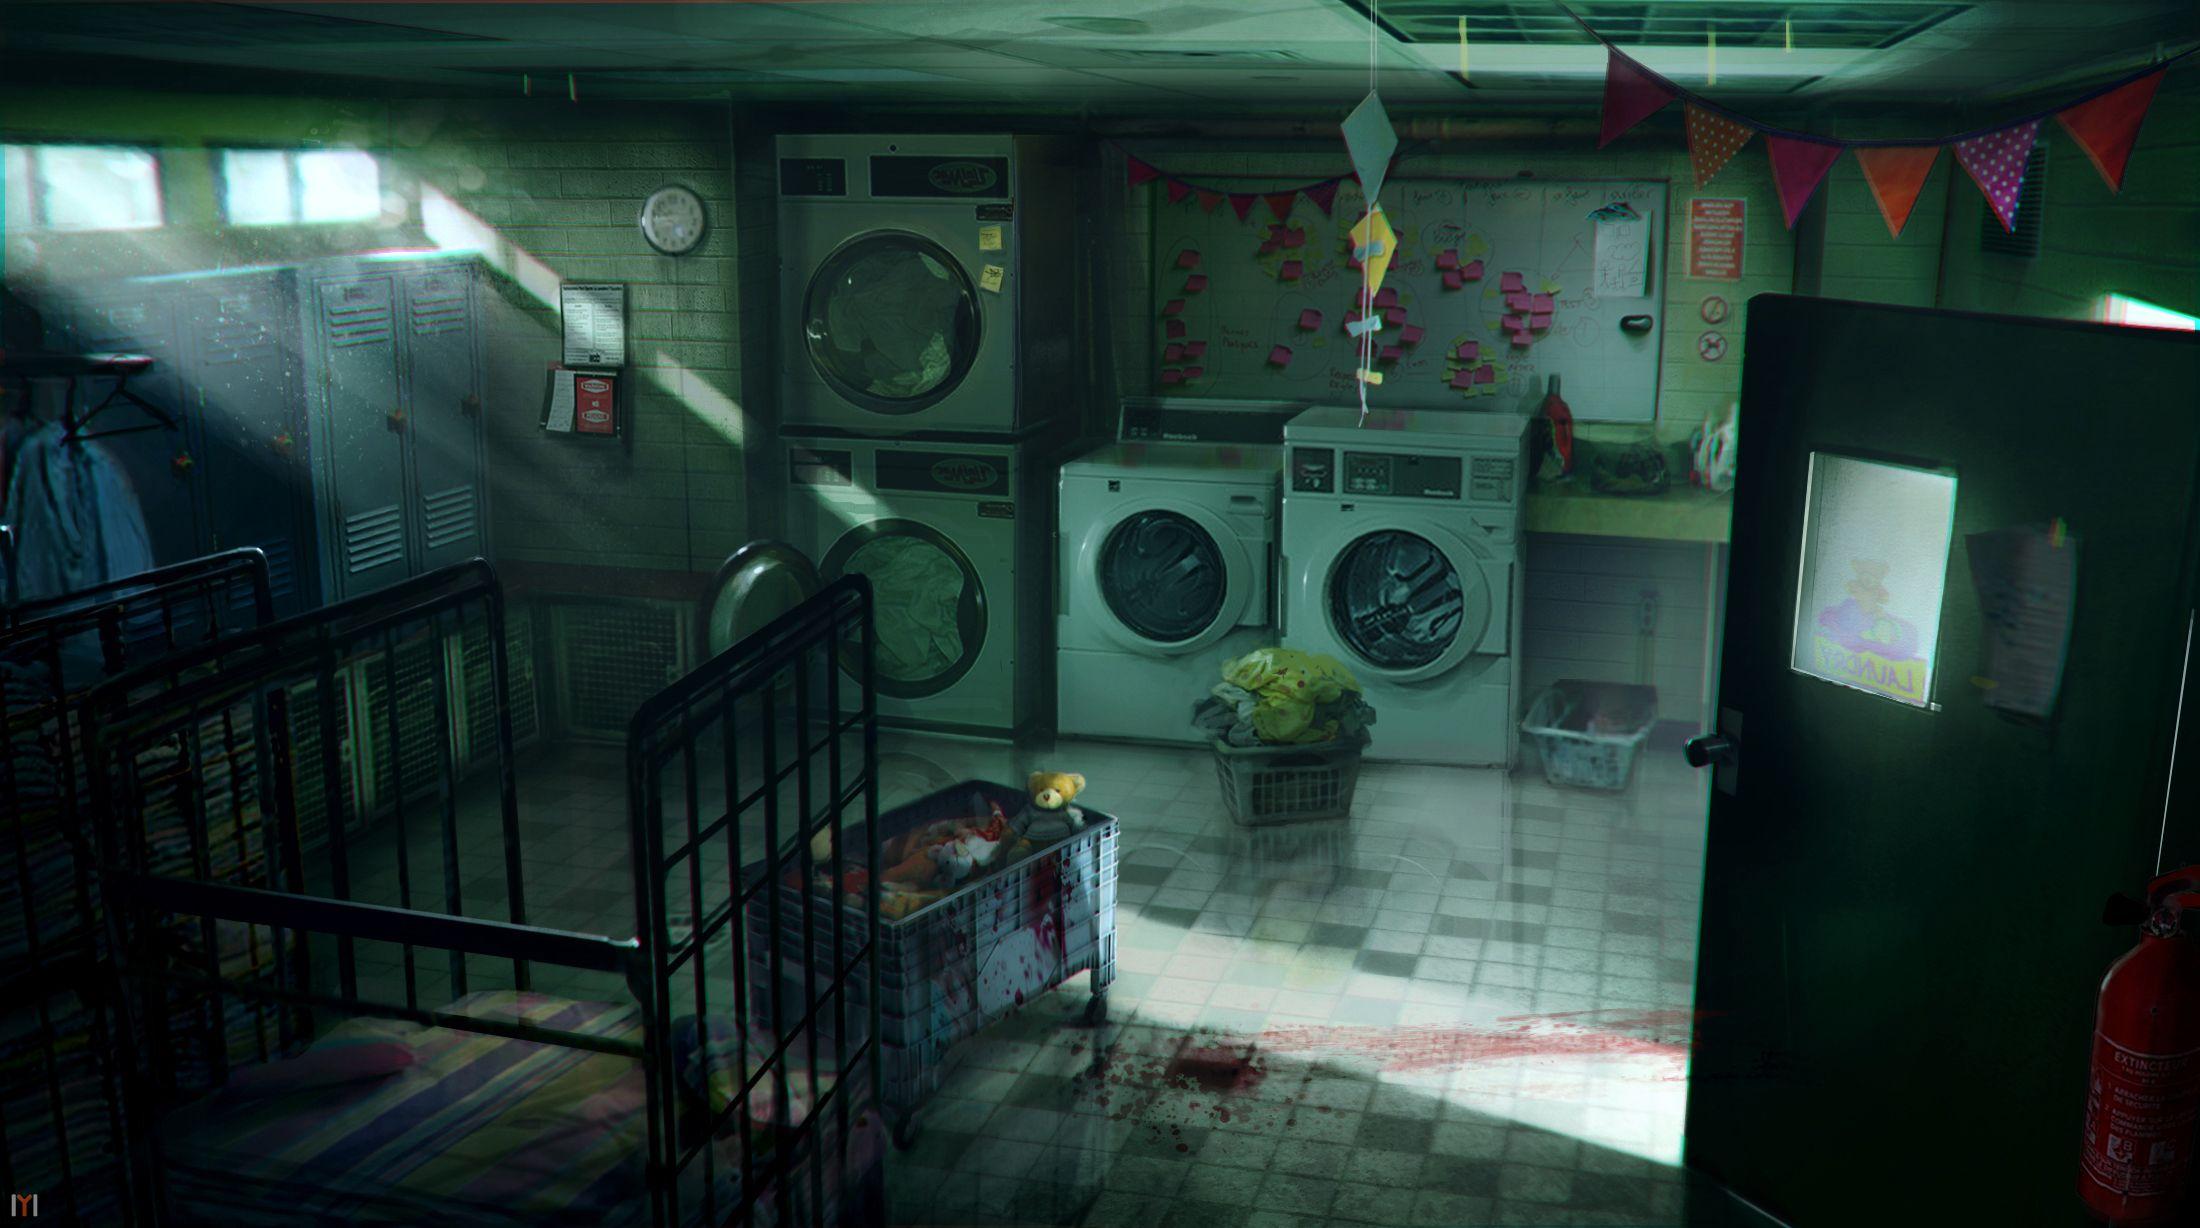 [Image: zu_comiccon_conceptart_nursery_laundry_1.jpg]